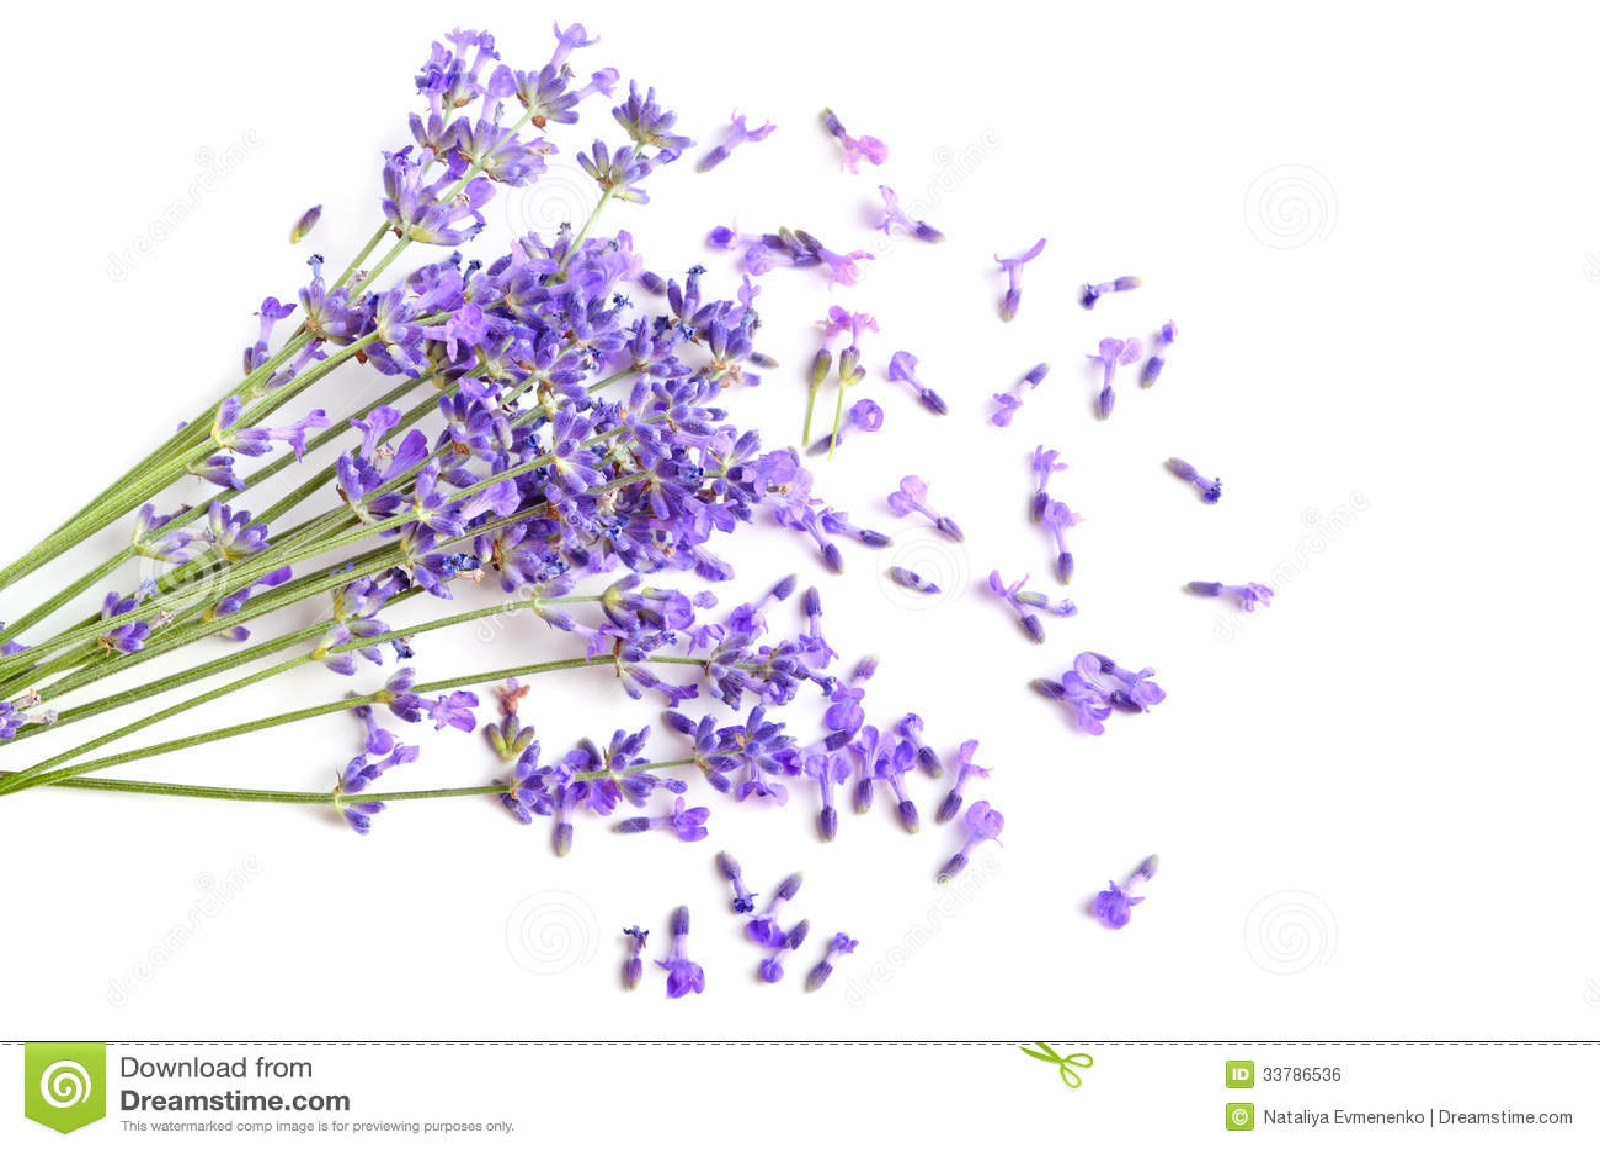 Verse lavendel